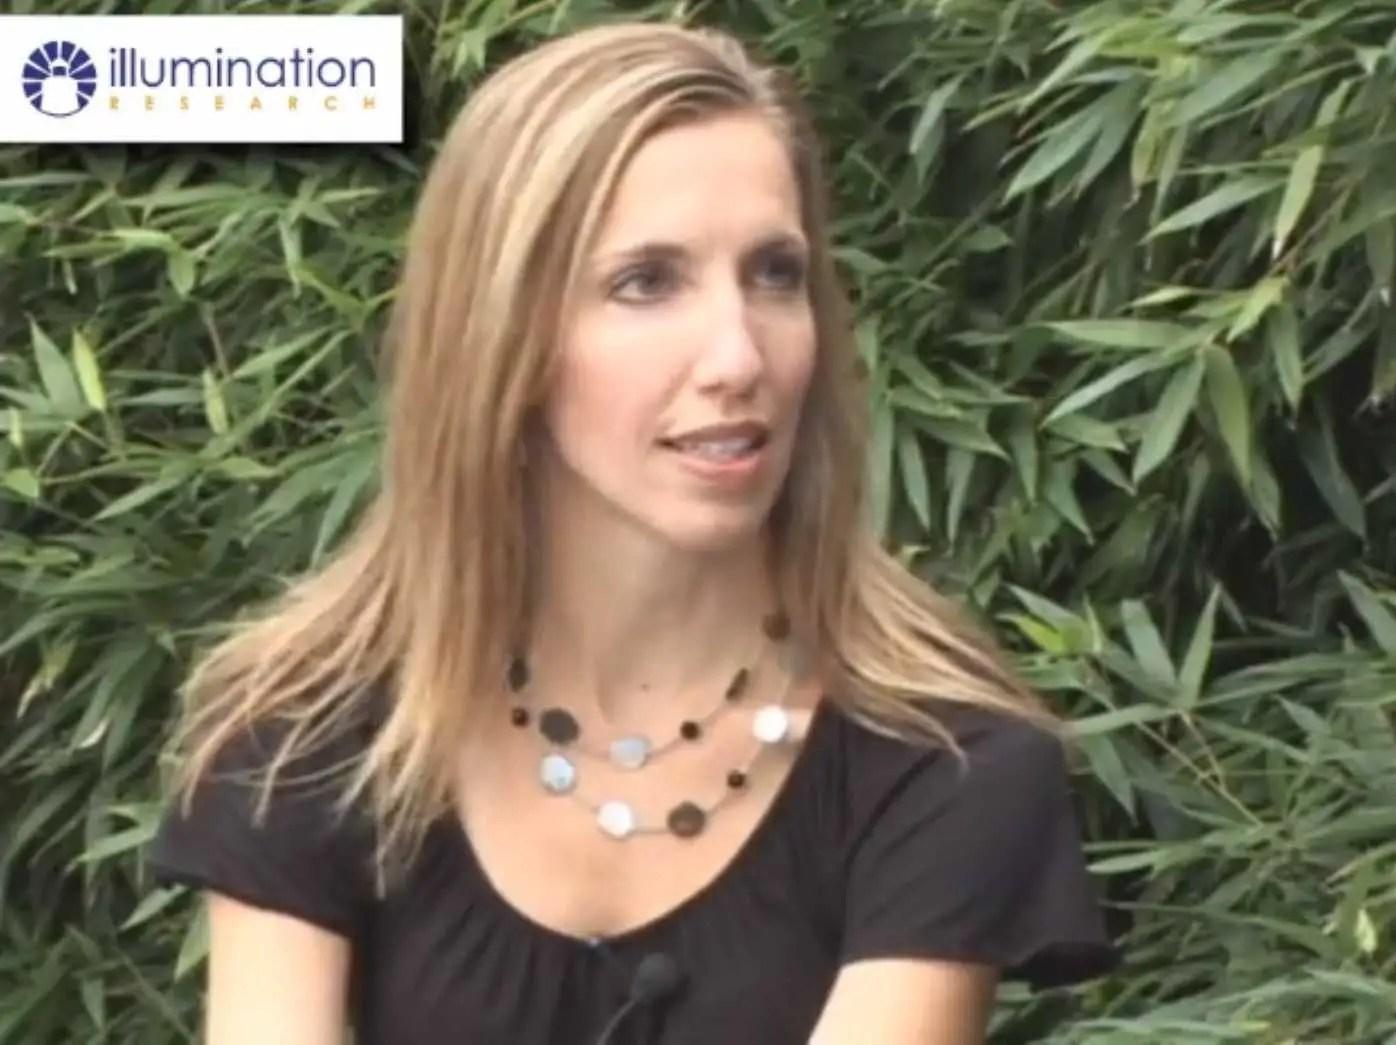 OHIO: Karri Bass, Founder and President Illumination Research